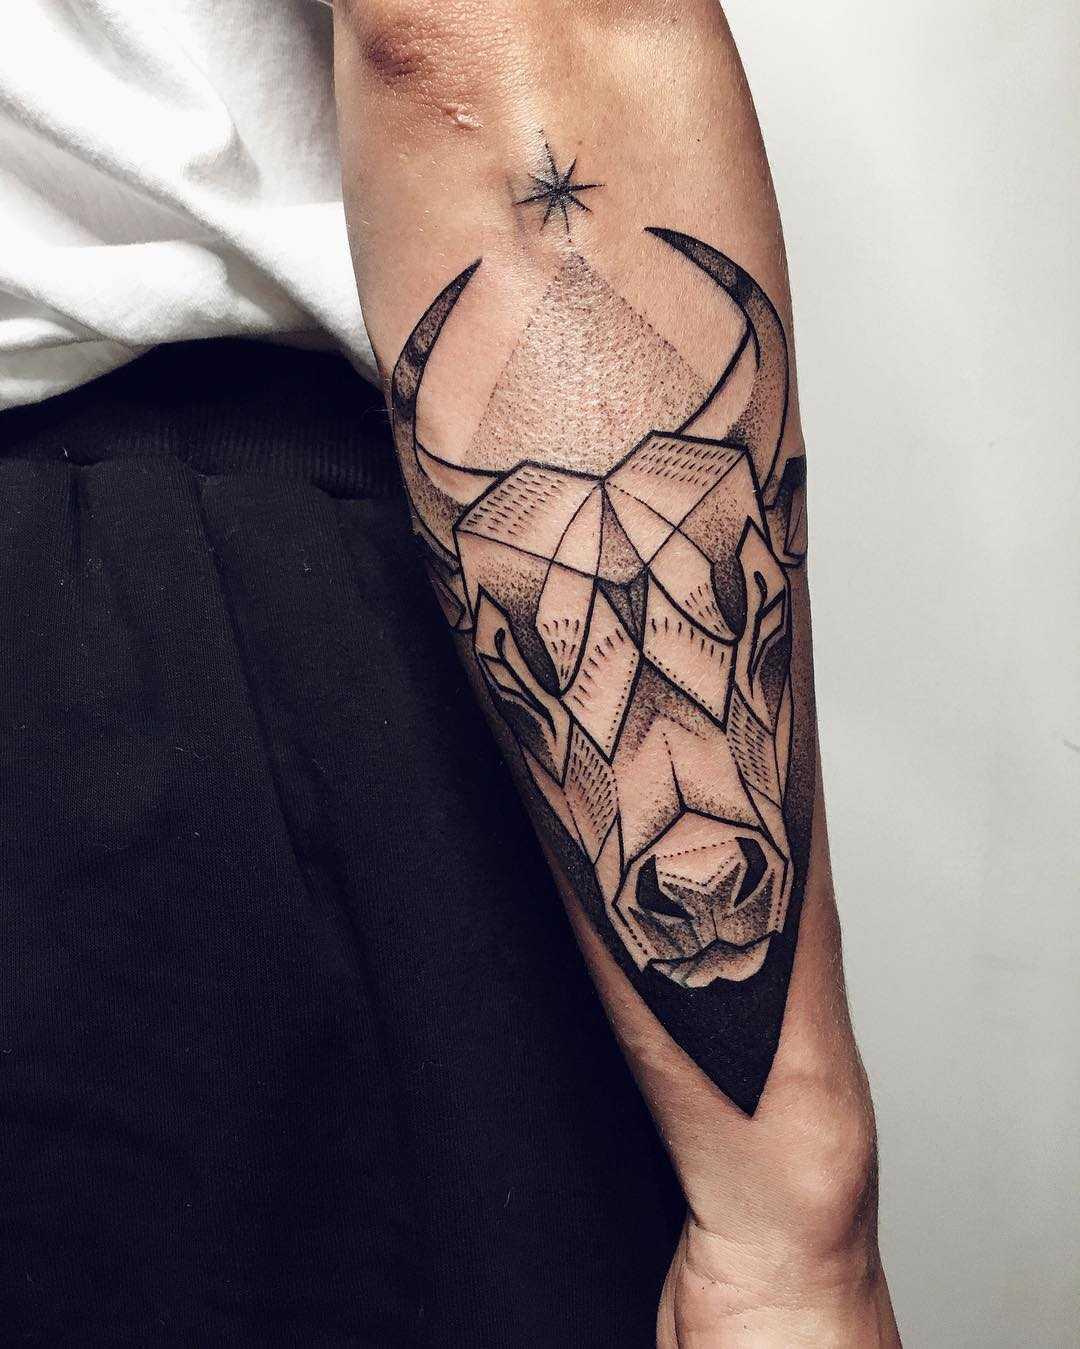 Taurus tattoo by Sasha Tattooing - Tattoogrid.net